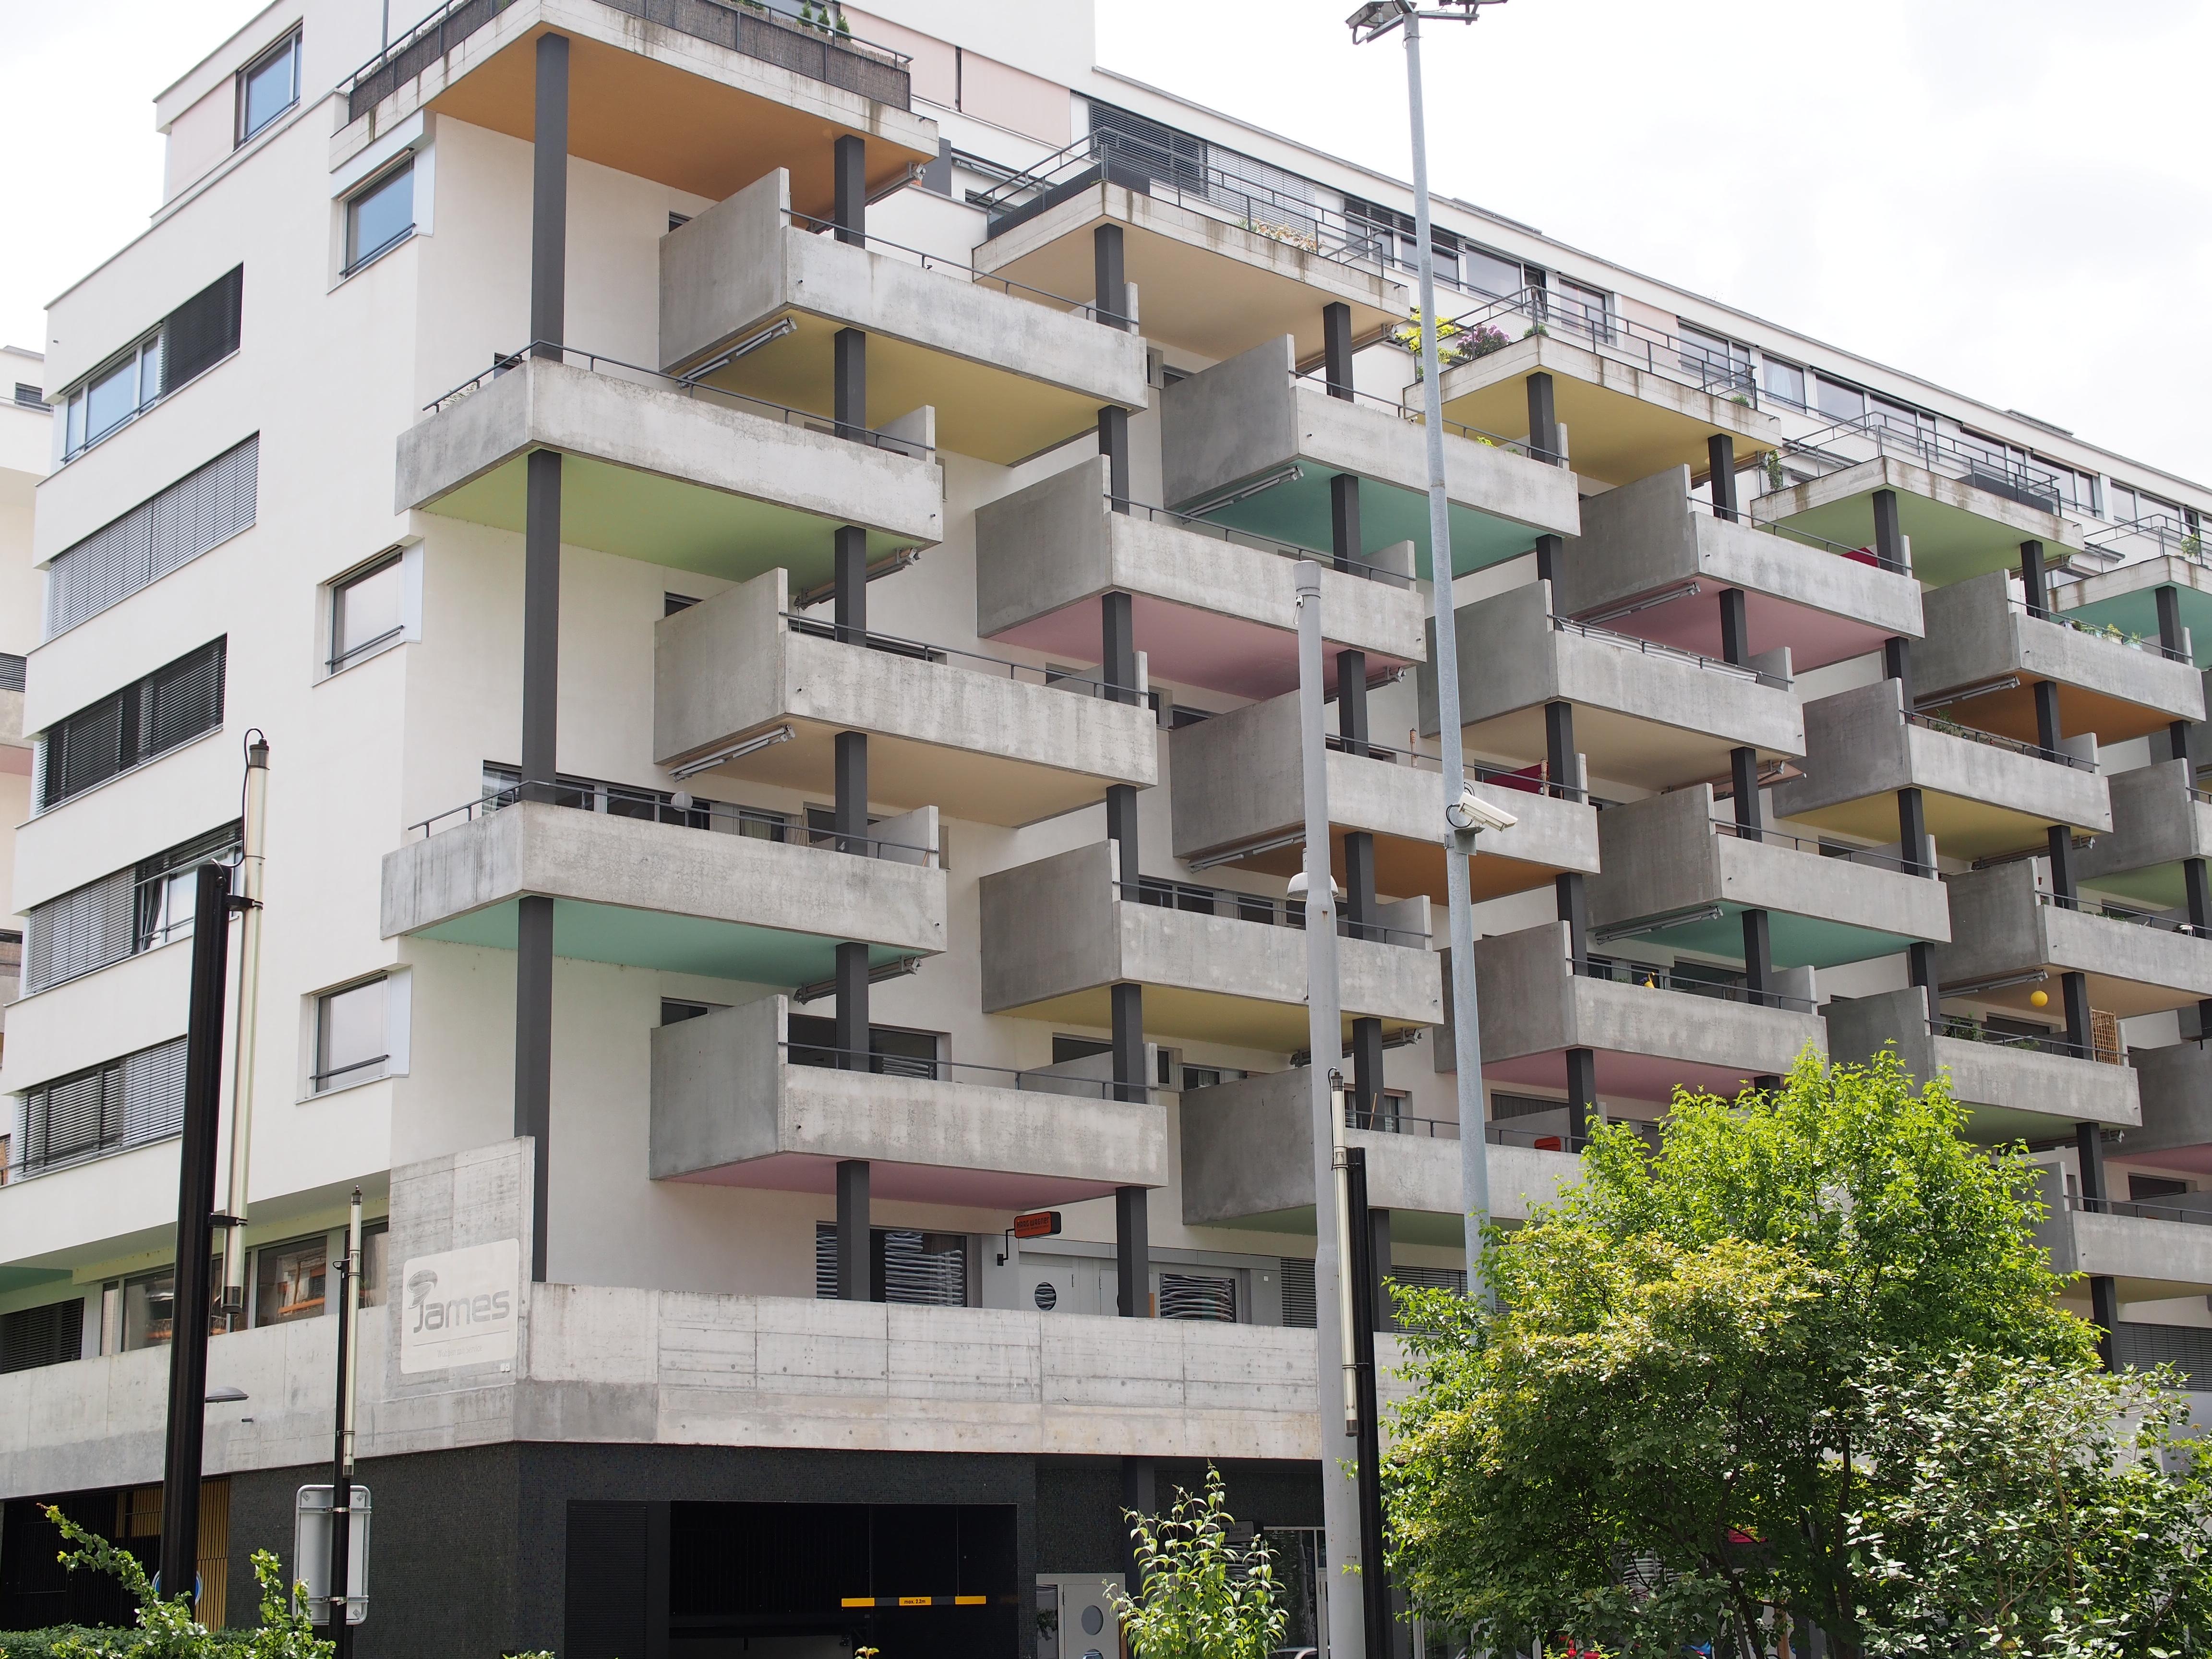 file altstetten wohnhaus balkon farbe bild 3 jpg wikimedia commons. Black Bedroom Furniture Sets. Home Design Ideas